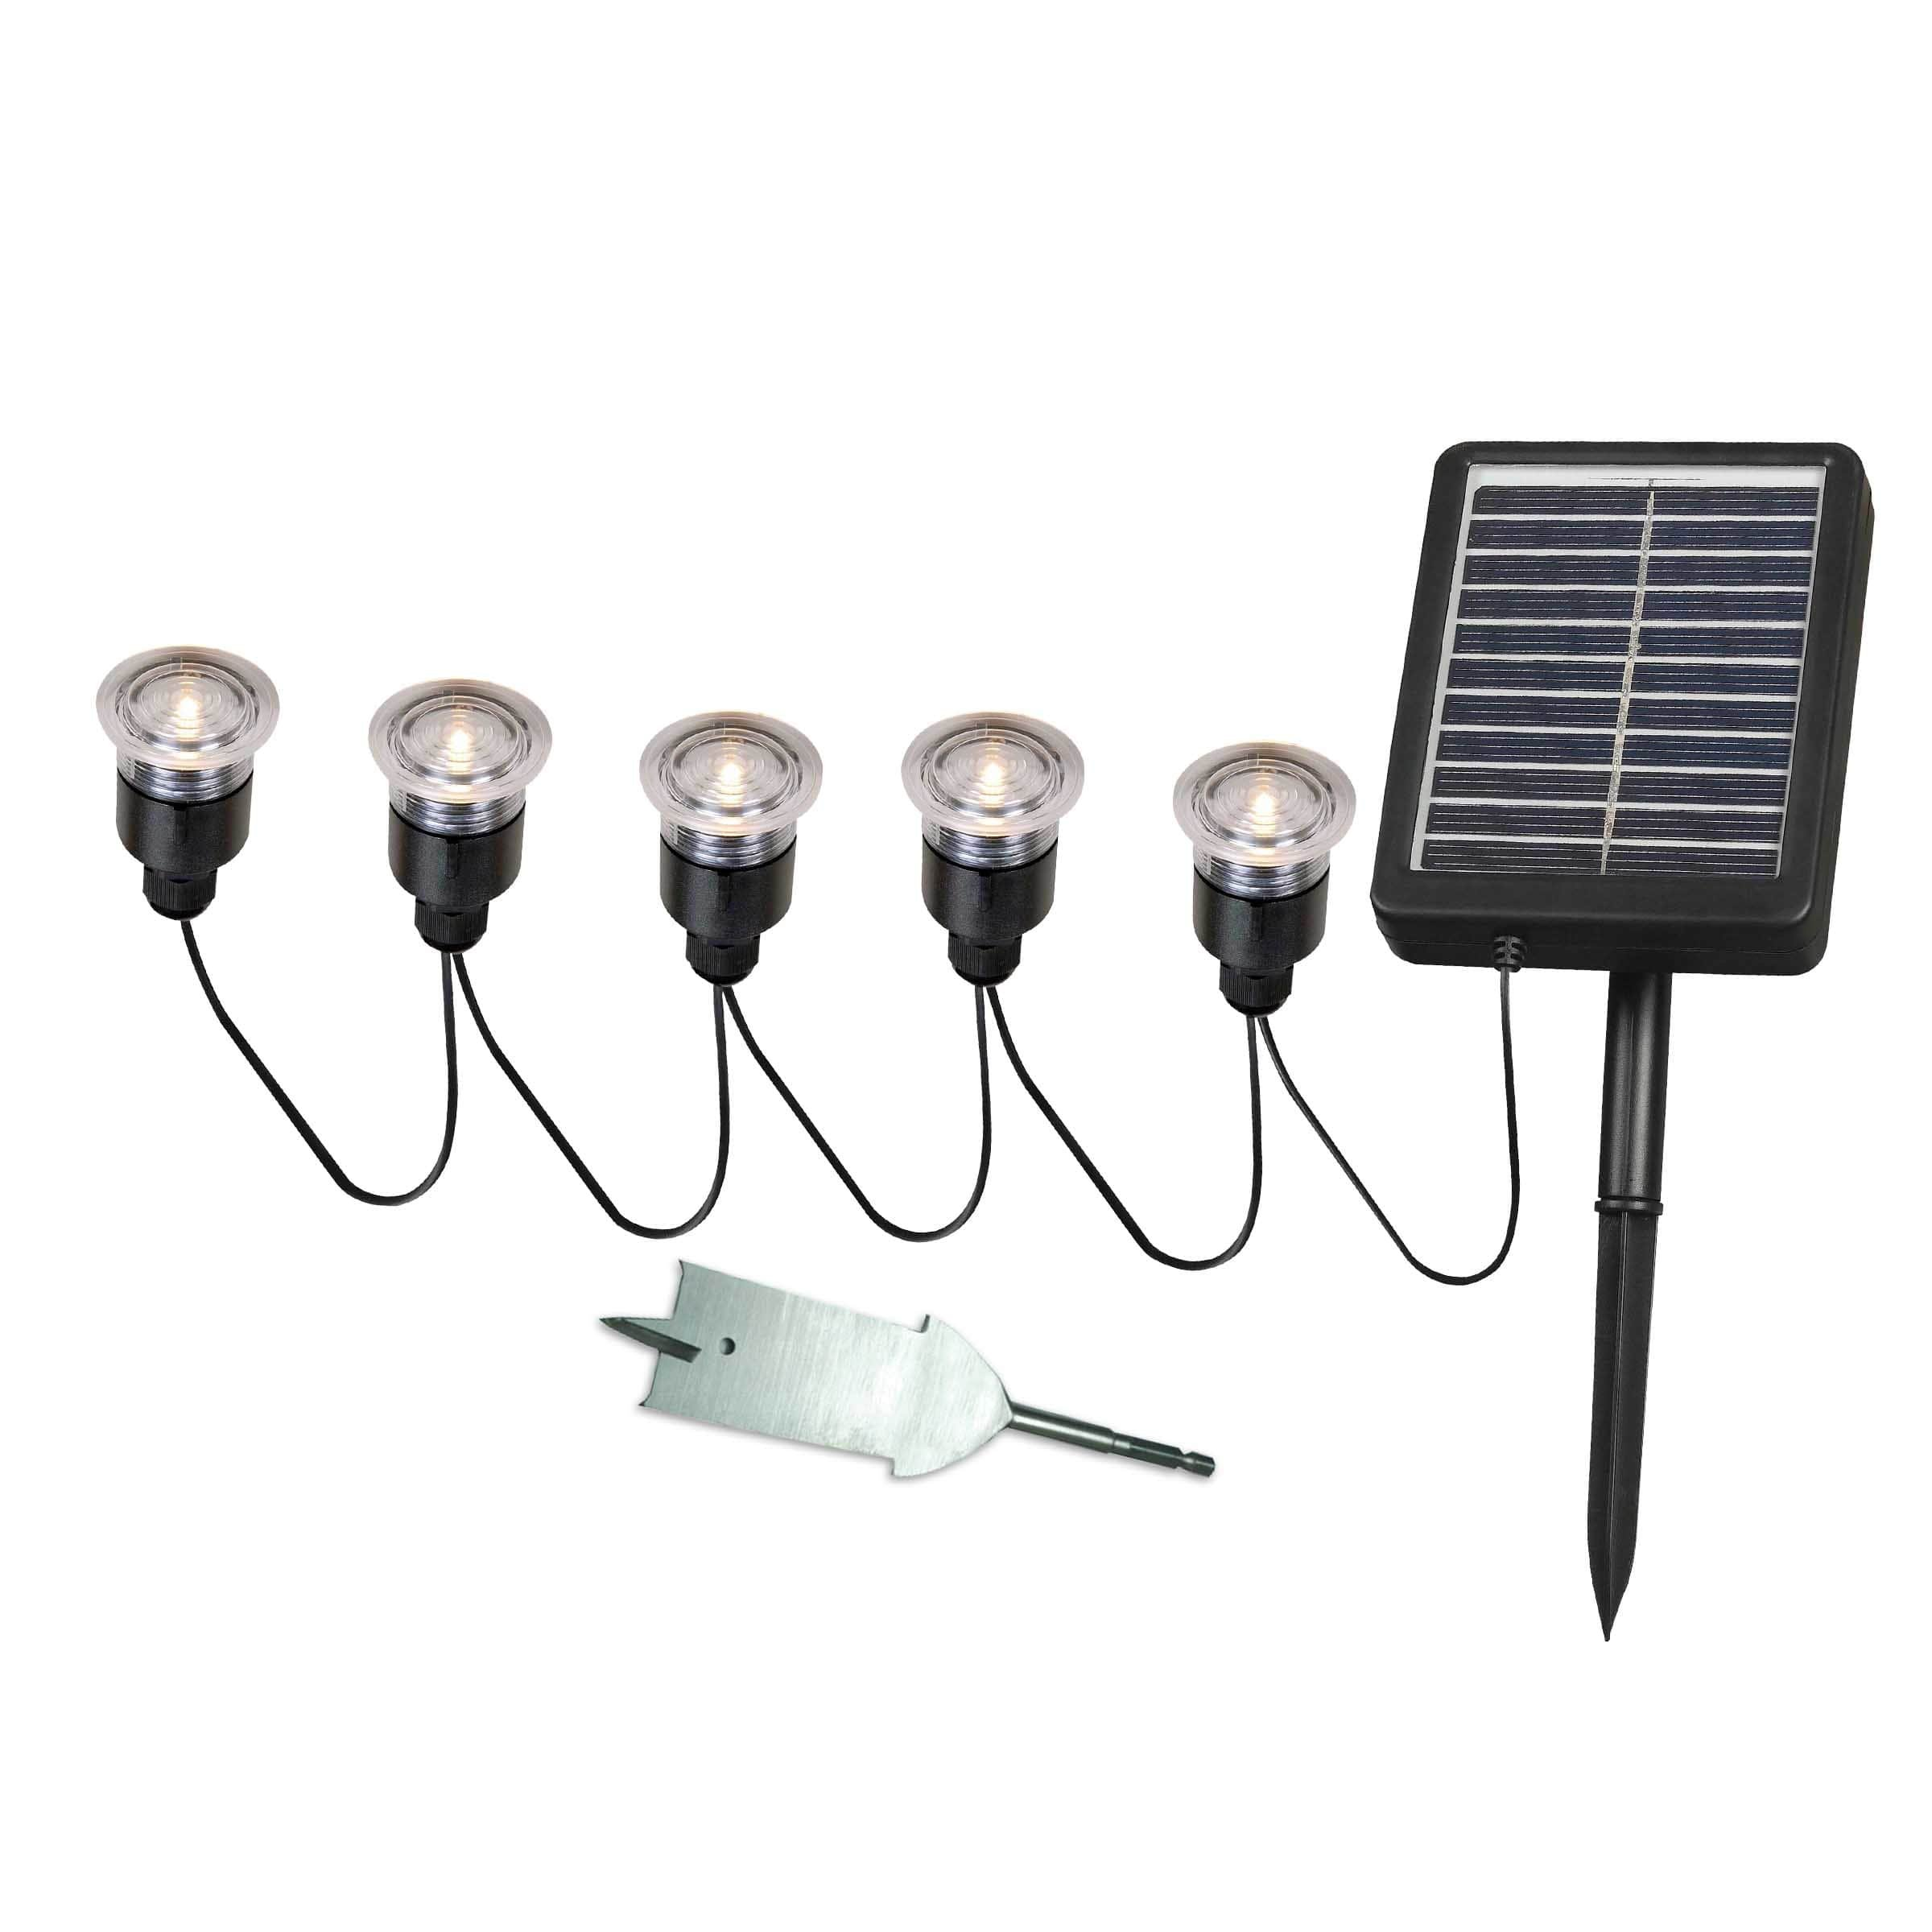 Design Craft Nova Solar Deck, Dock and Path Light 5-light String with Remote Panel by Design Craft